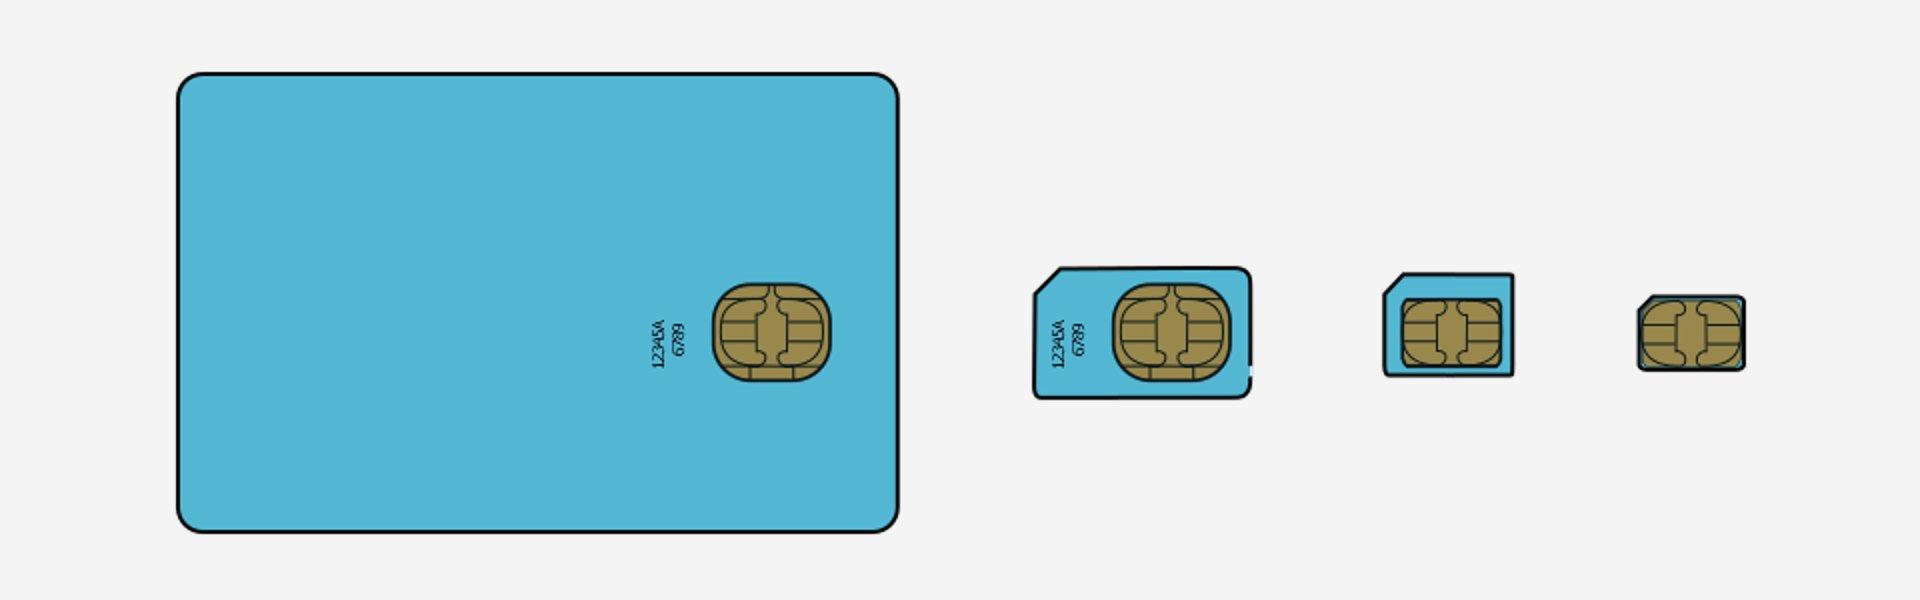 (From Left To Right) Full-size SIM, Mini SIM, Micro SIM, Nano SIM